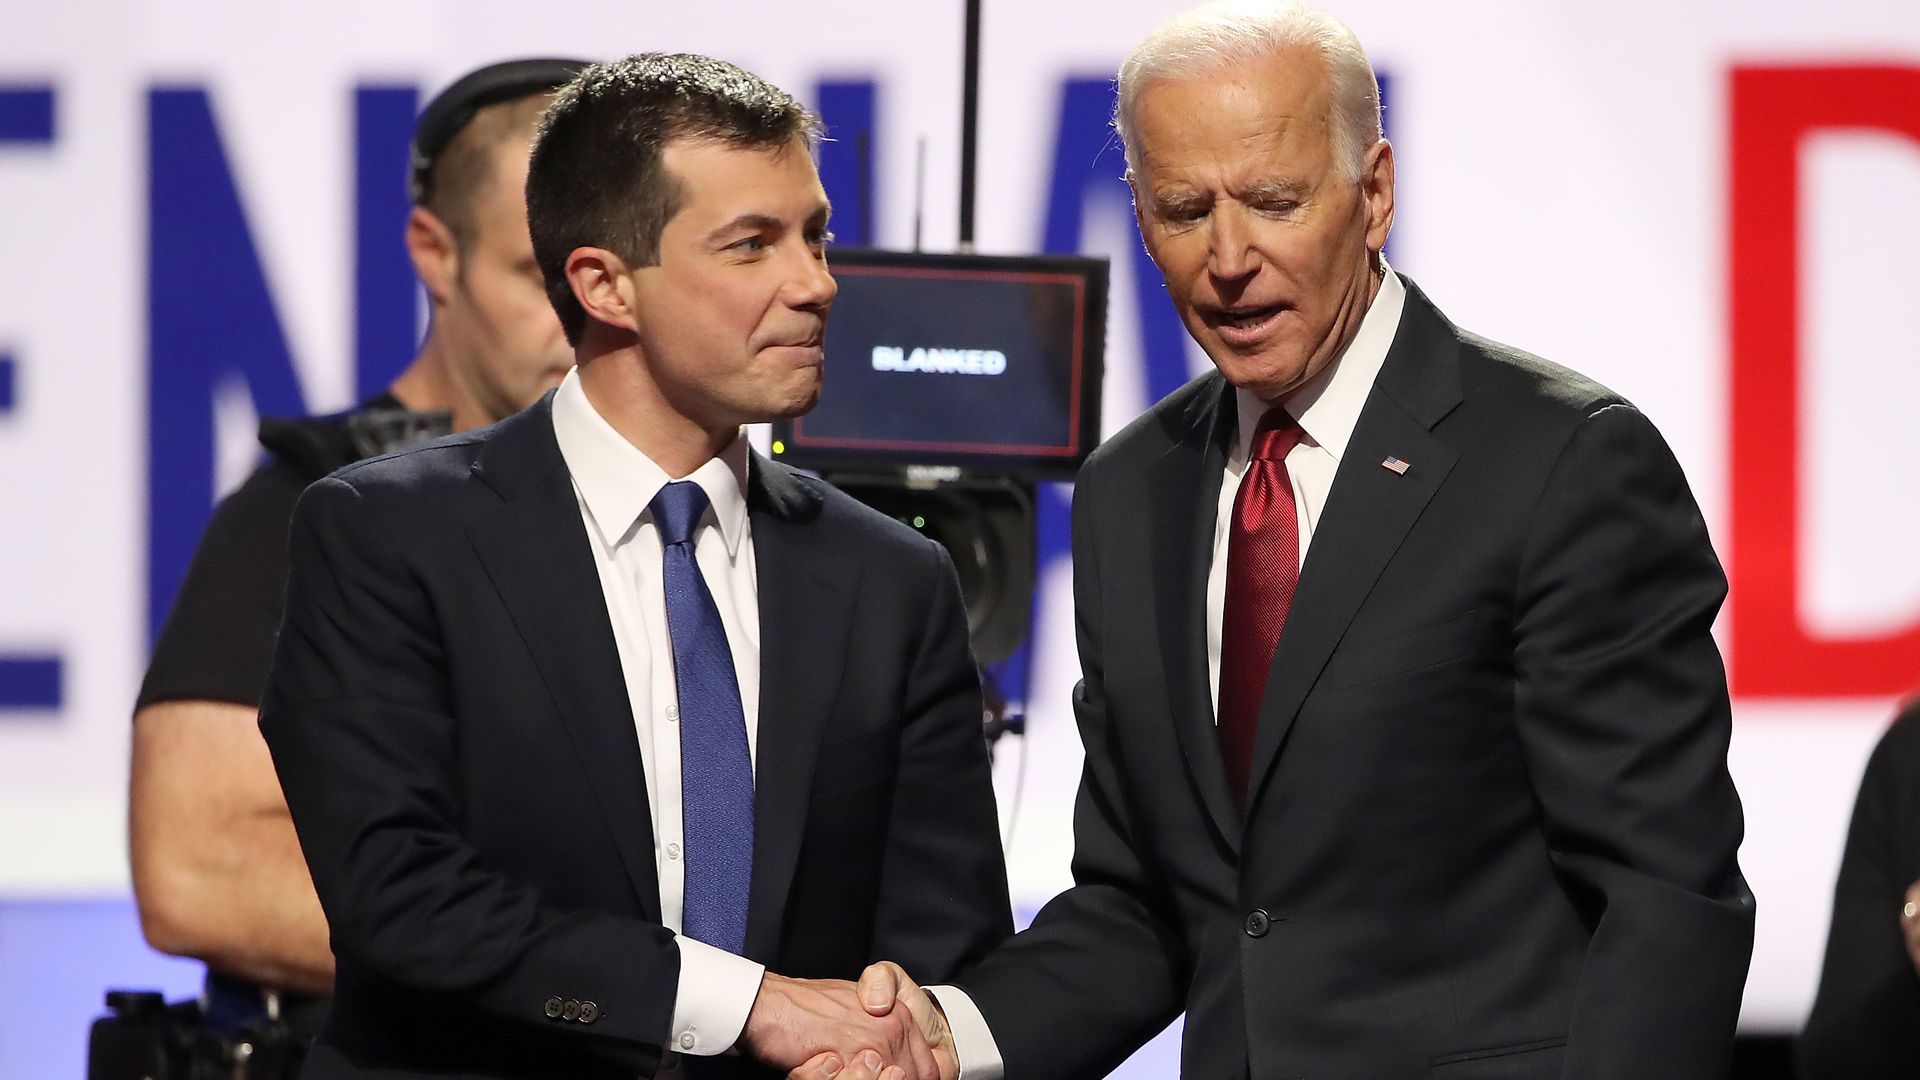 Pete buttigieg shakes hands with Joe biden.